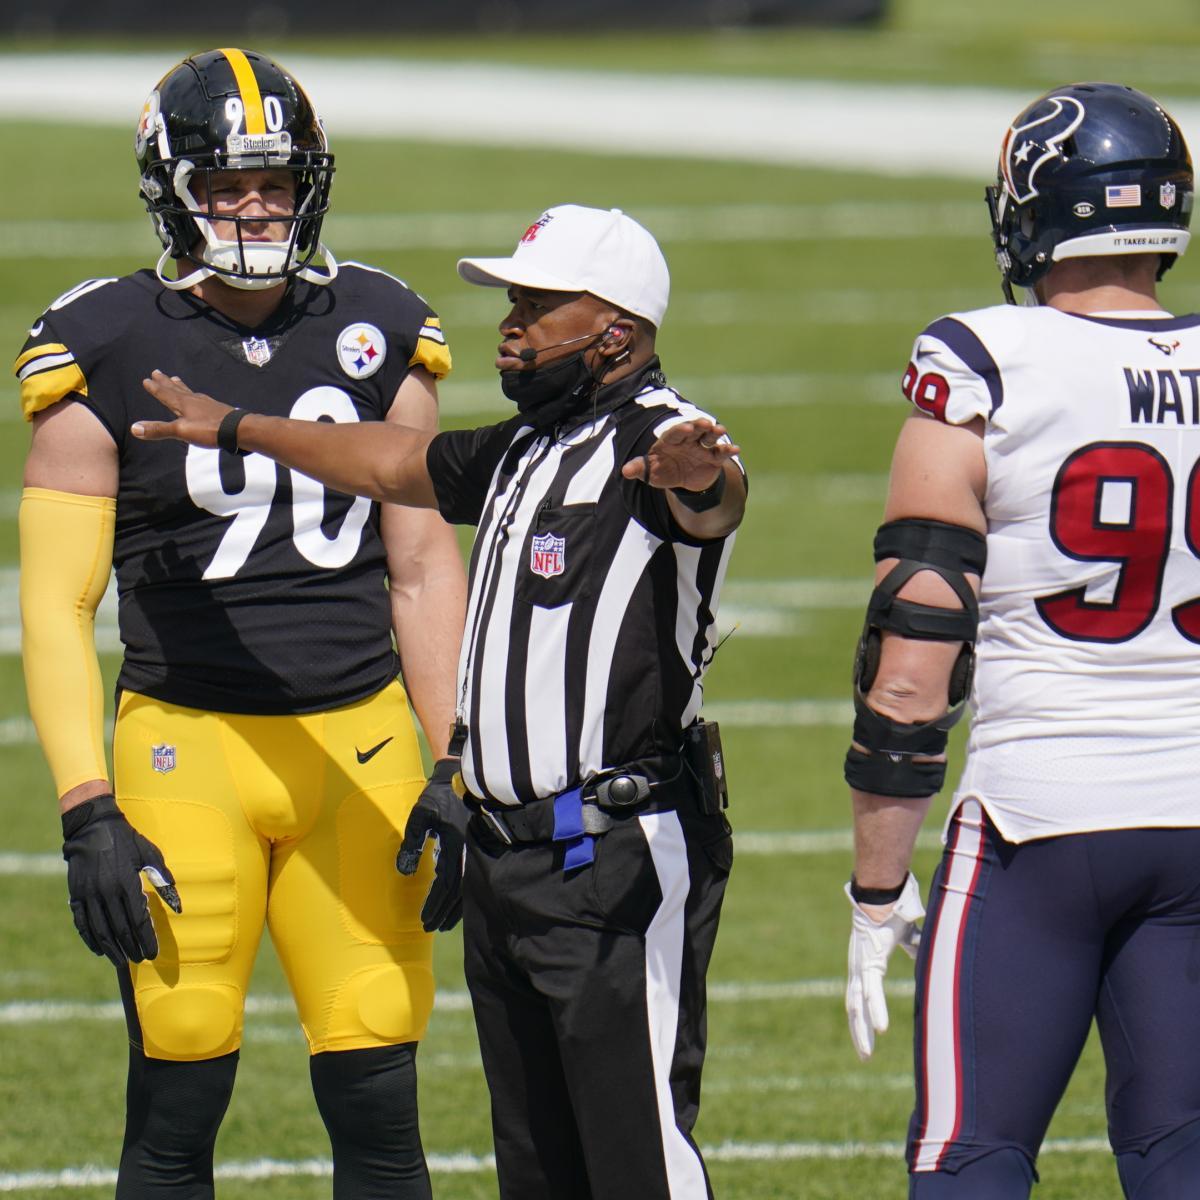 J.J. Watt Says Brother T.J. Should Have Won NFL DPOY Award over Aaron Donald